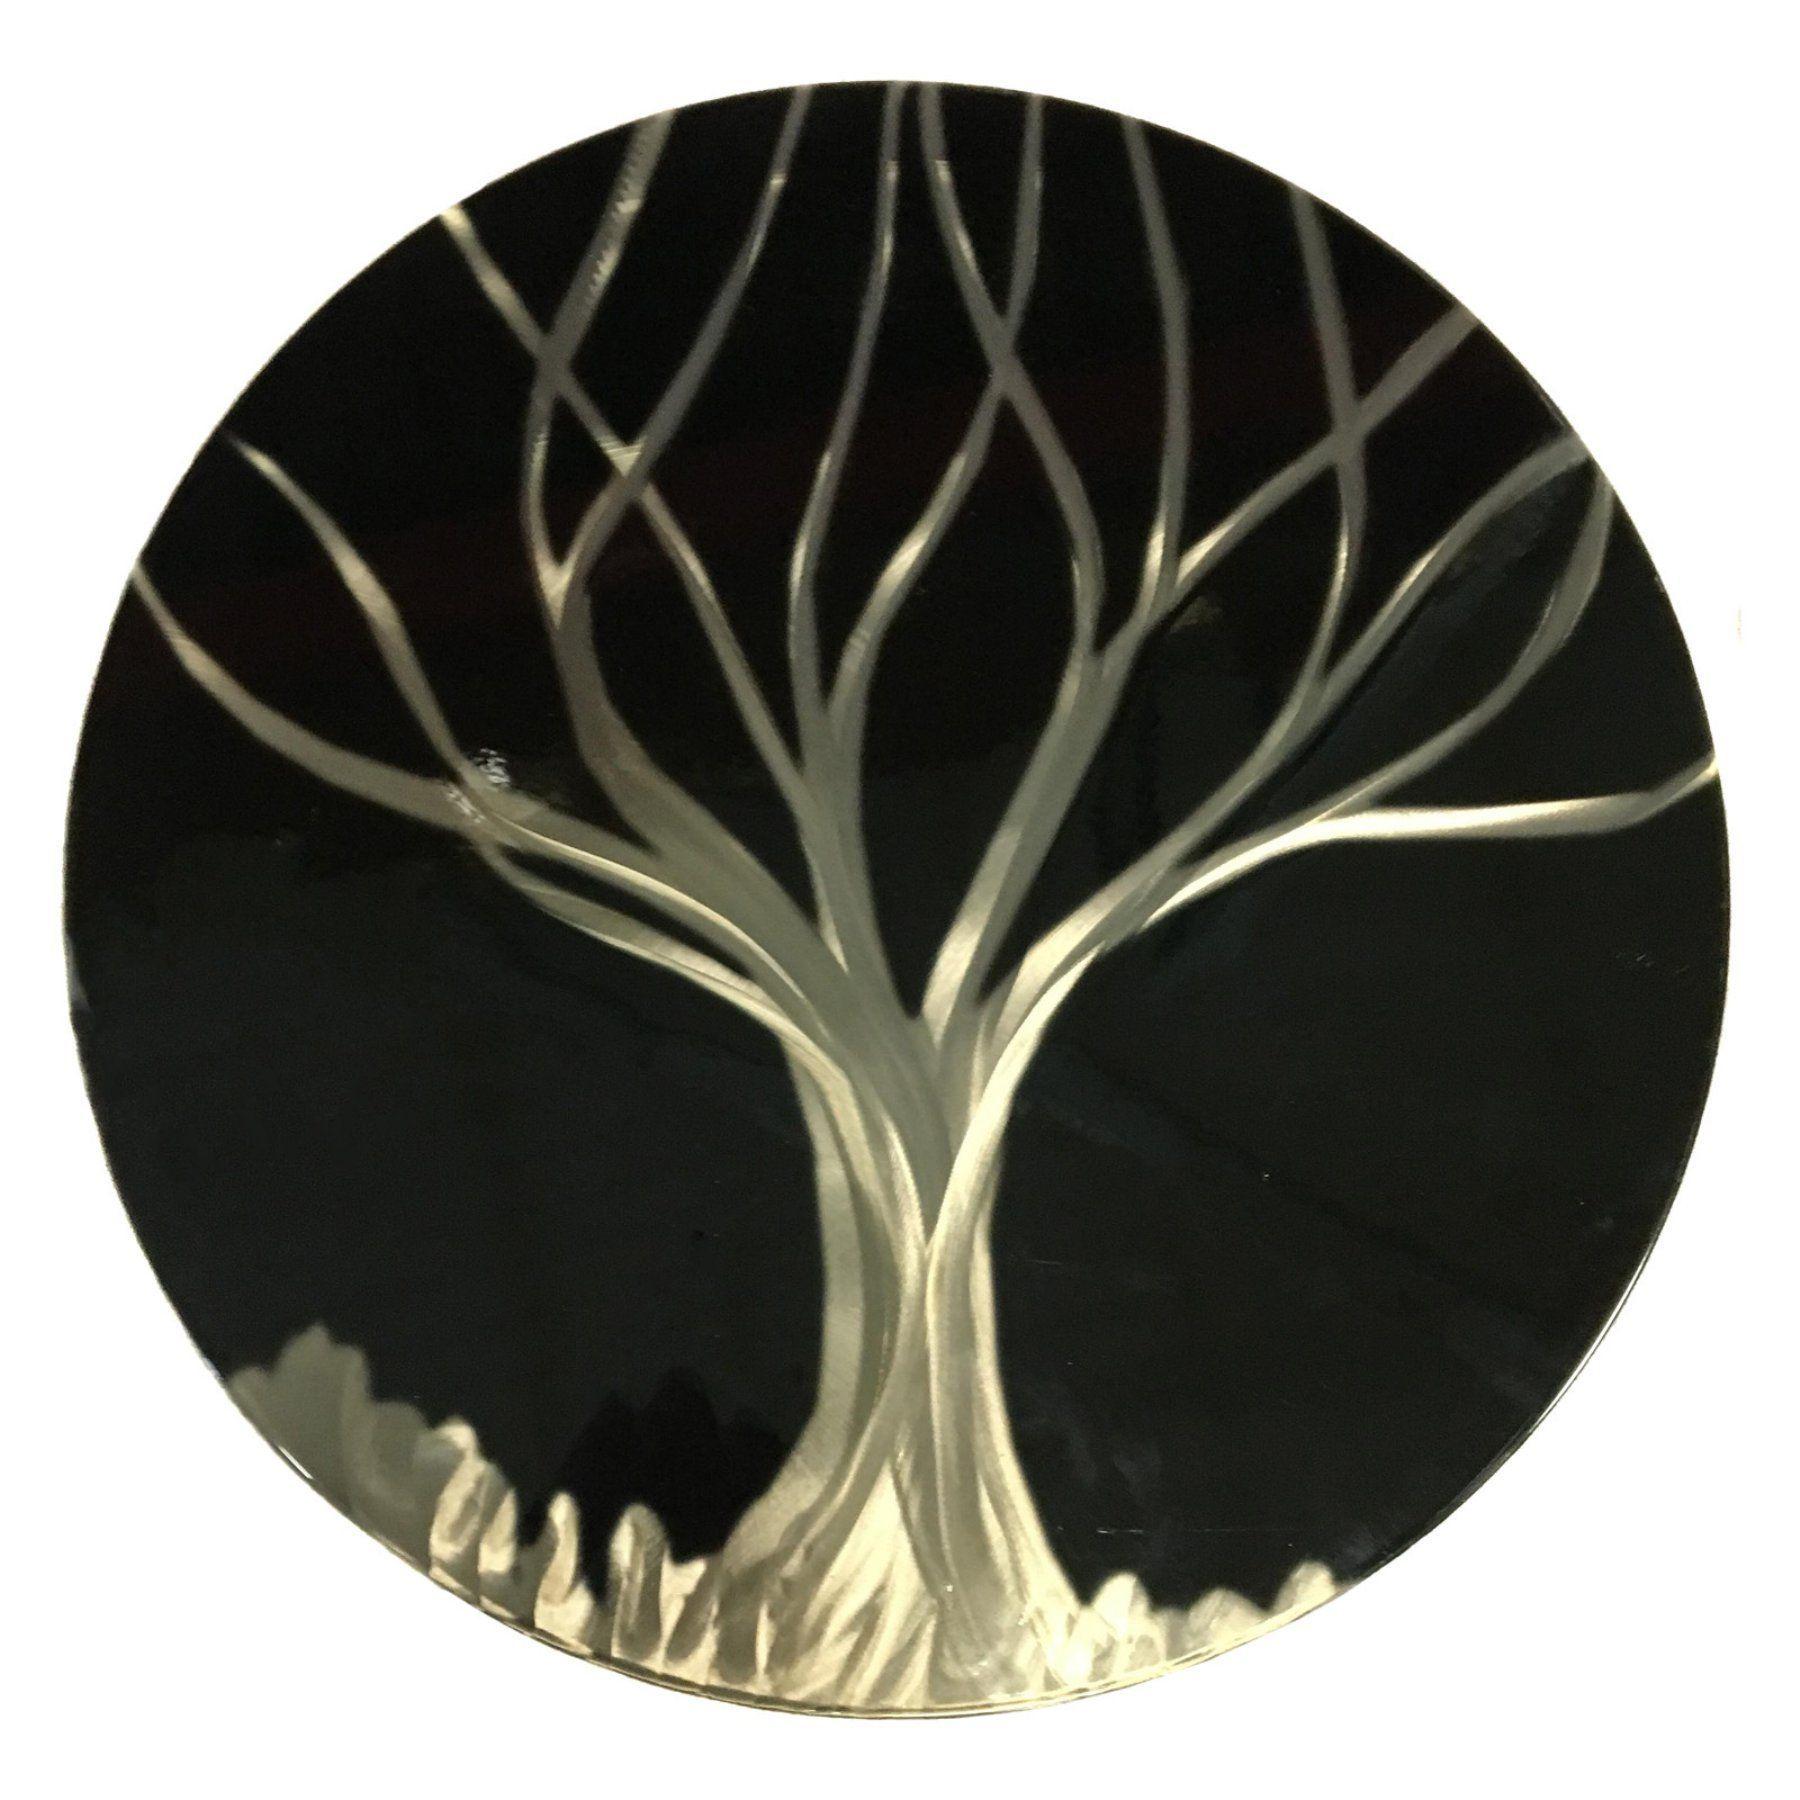 Next Innovations Black Silver Grind Tree Indoor/Outdoor Metal Wall Art - 101409003-BLACKTREE  sc 1 st  Pinterest & Next Innovations Black Silver Grind Tree Indoor/Outdoor Metal Wall ...